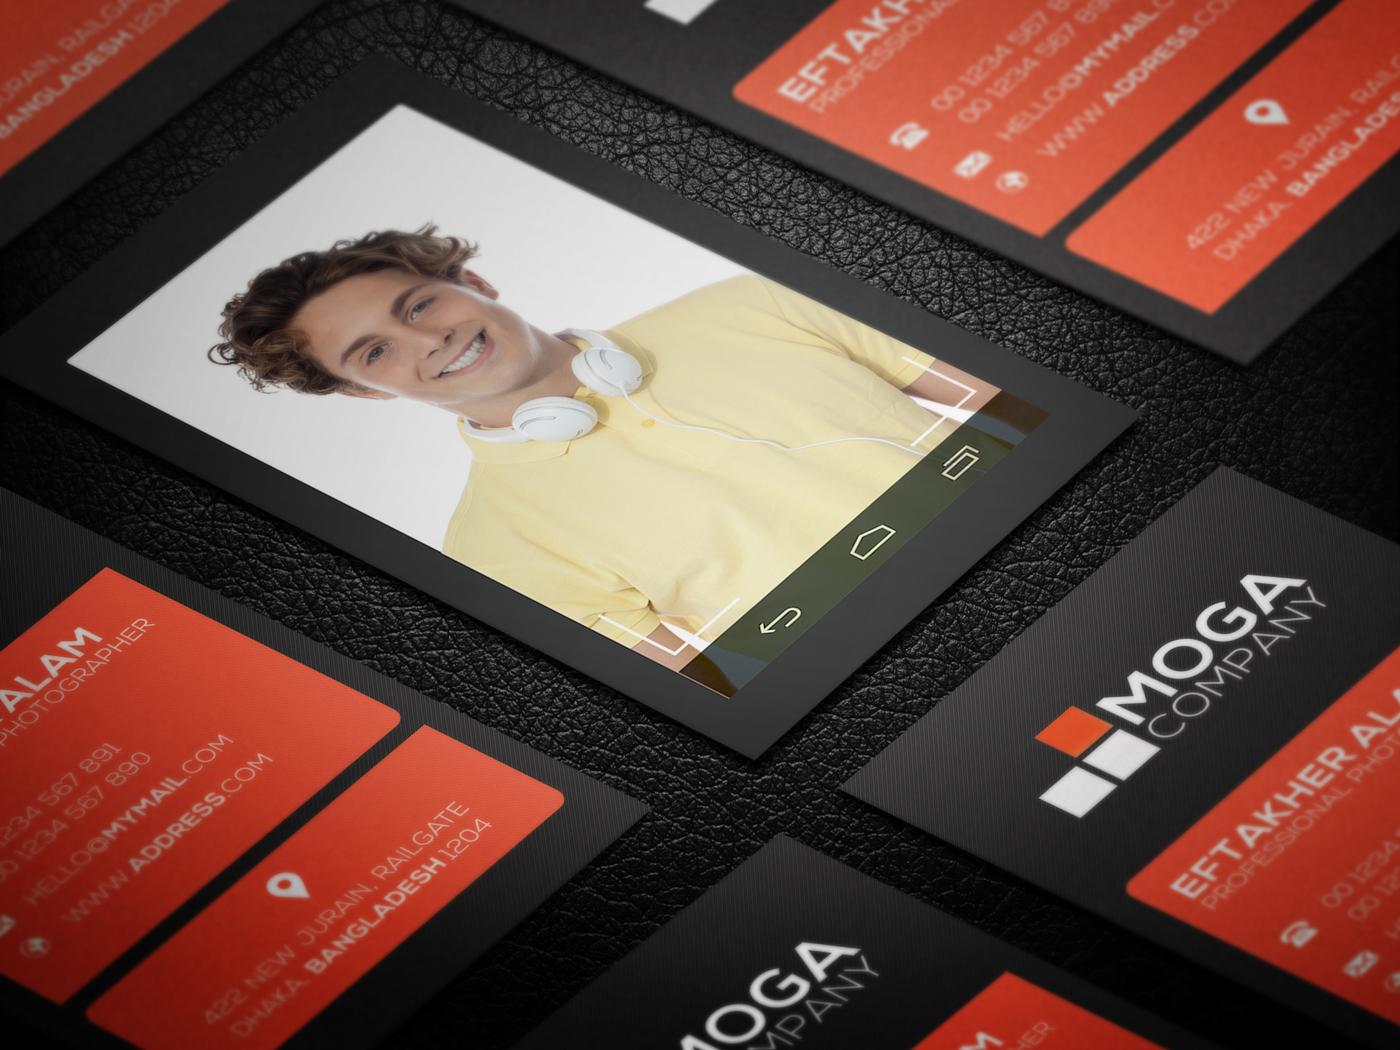 freebie free Free Resume free business card business card Resume free download free resume download Curriculum Vitae